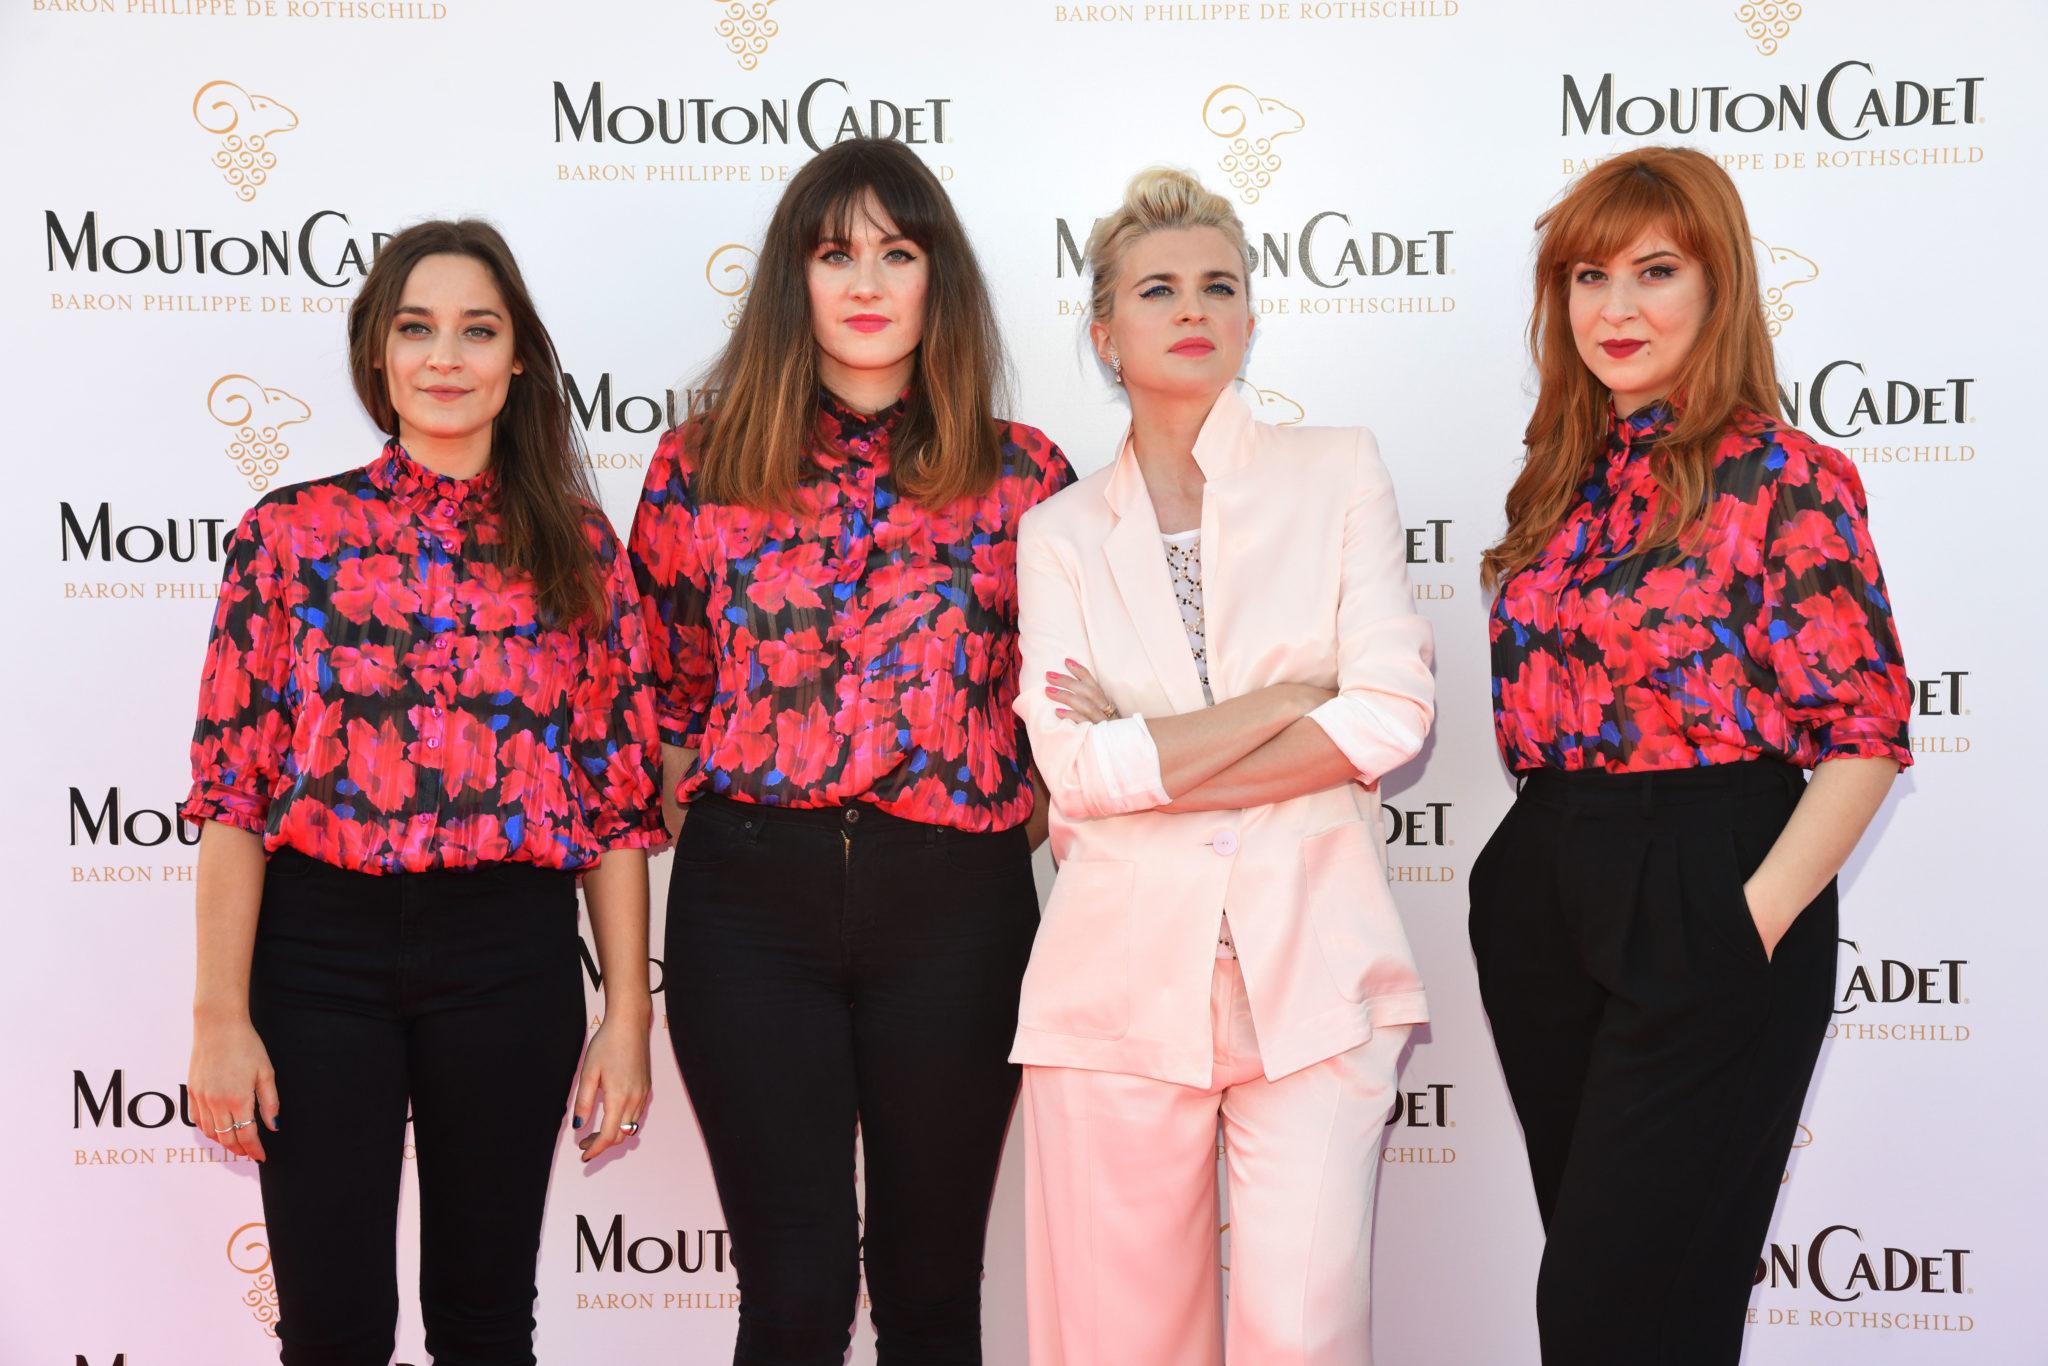 Hollysiz Mouton Cadet Cannes 2019